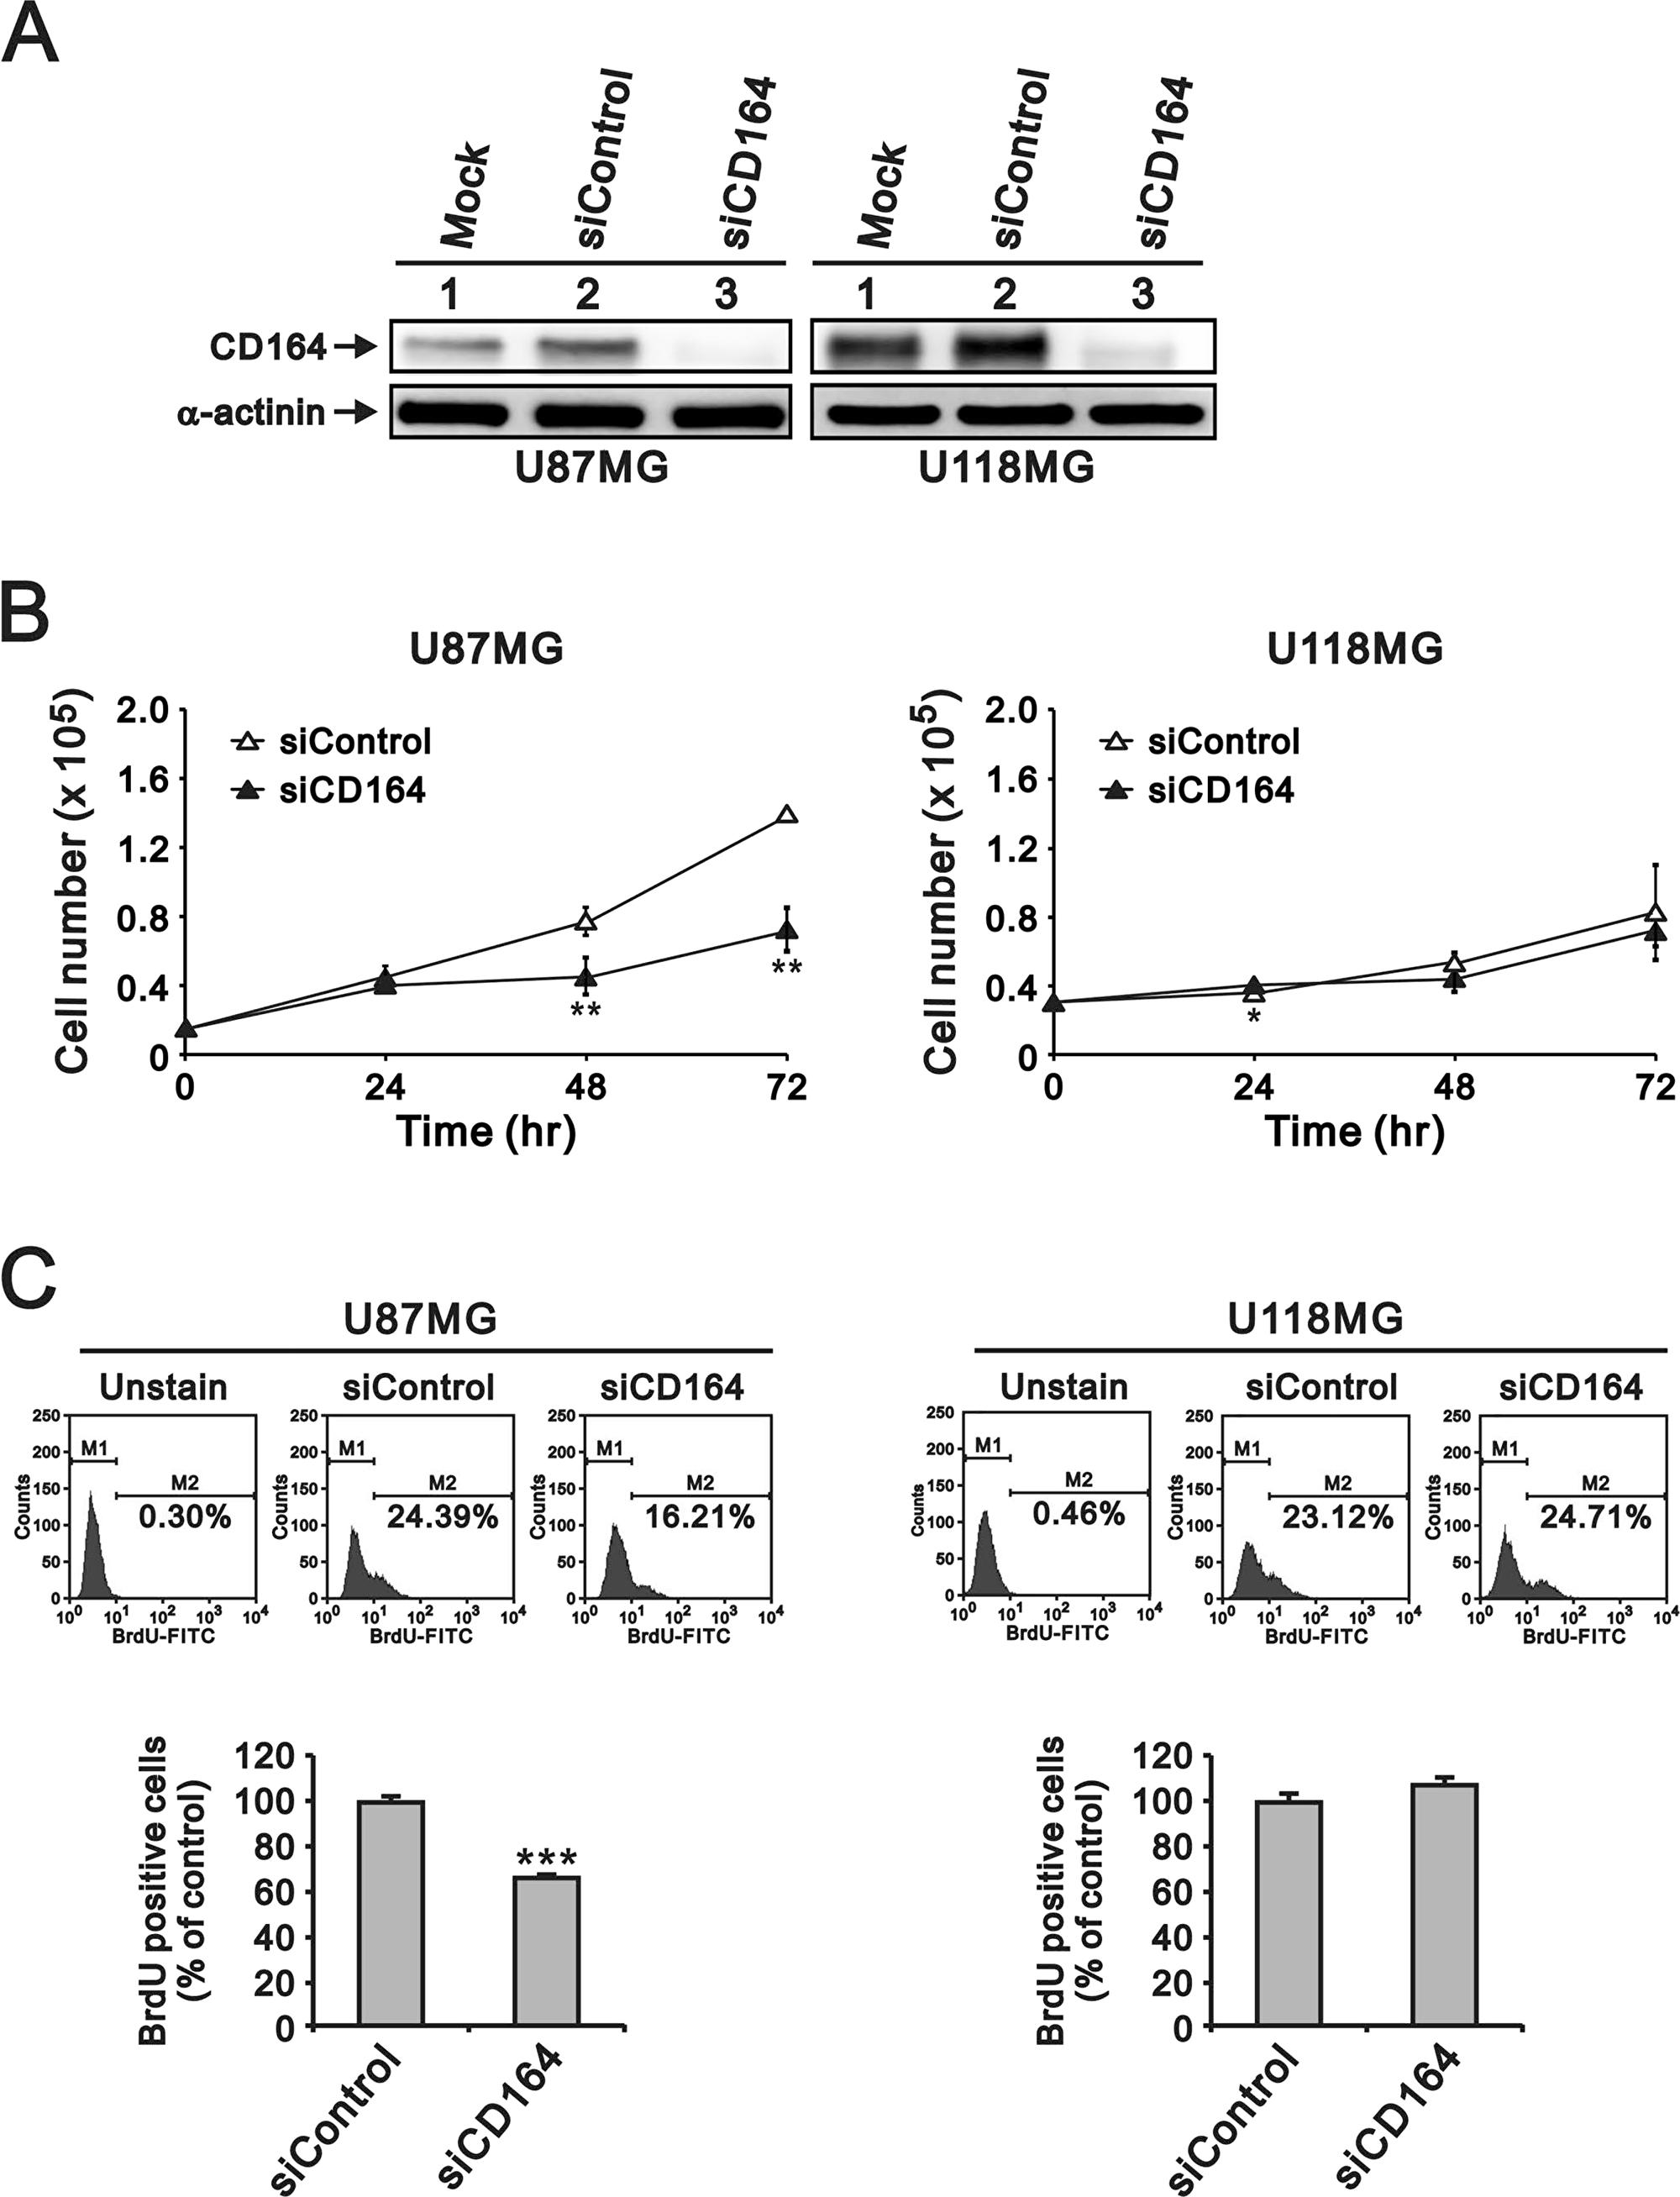 Depletion of CD164 expression decreases proliferation in GBM cells.